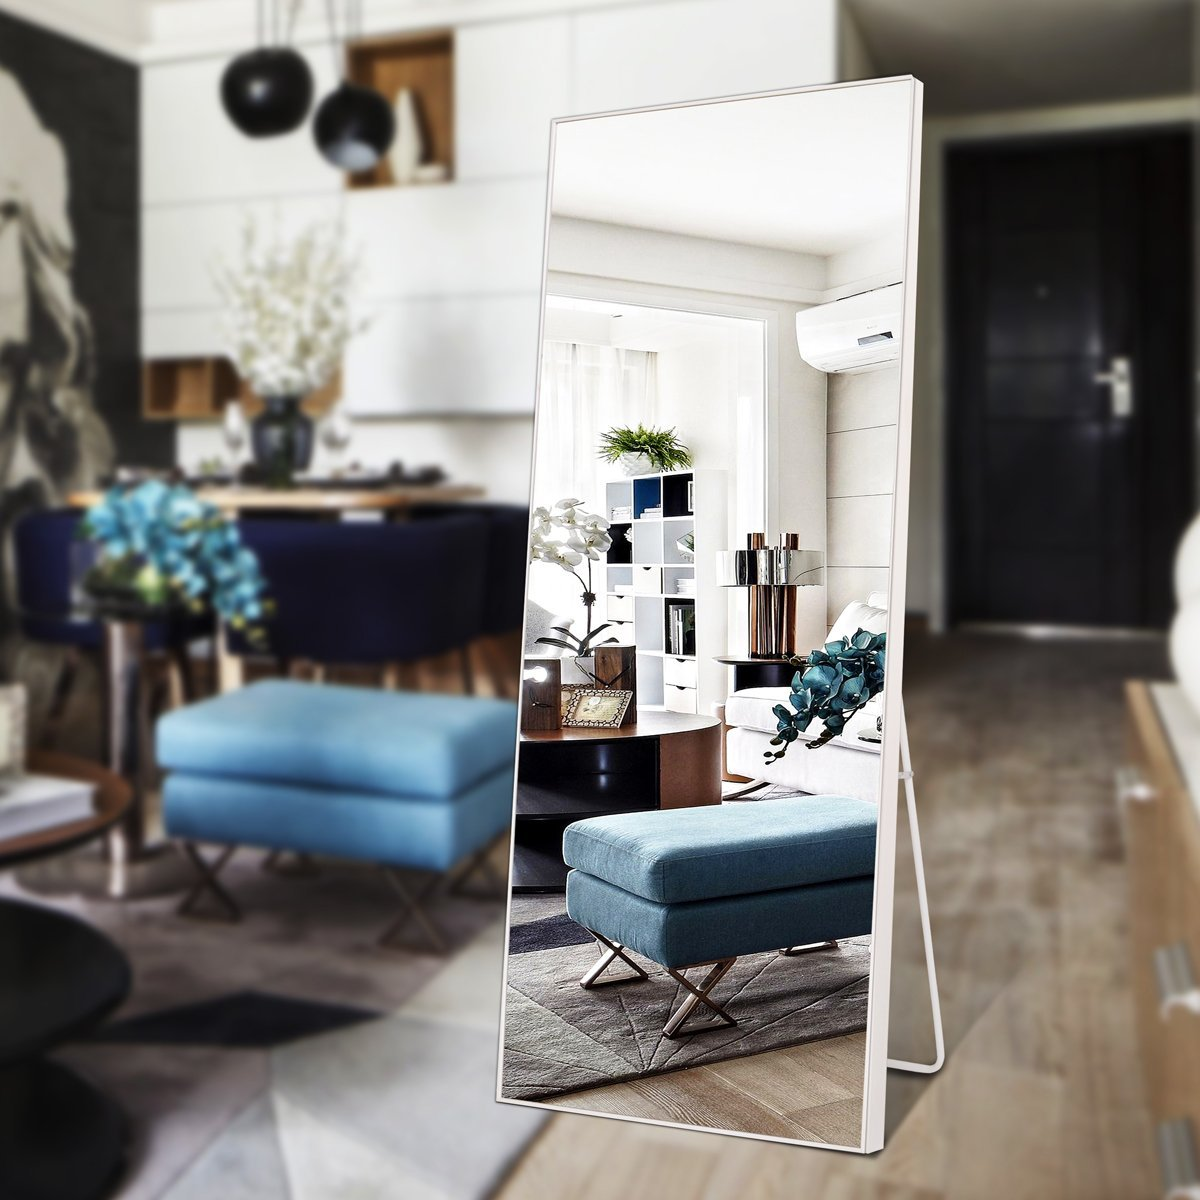 "703E Solid Wood Frame Full Length Floor Mirror Bedroom Dressing Standing Mirror, 65""x22"" (Black)... by 703E"